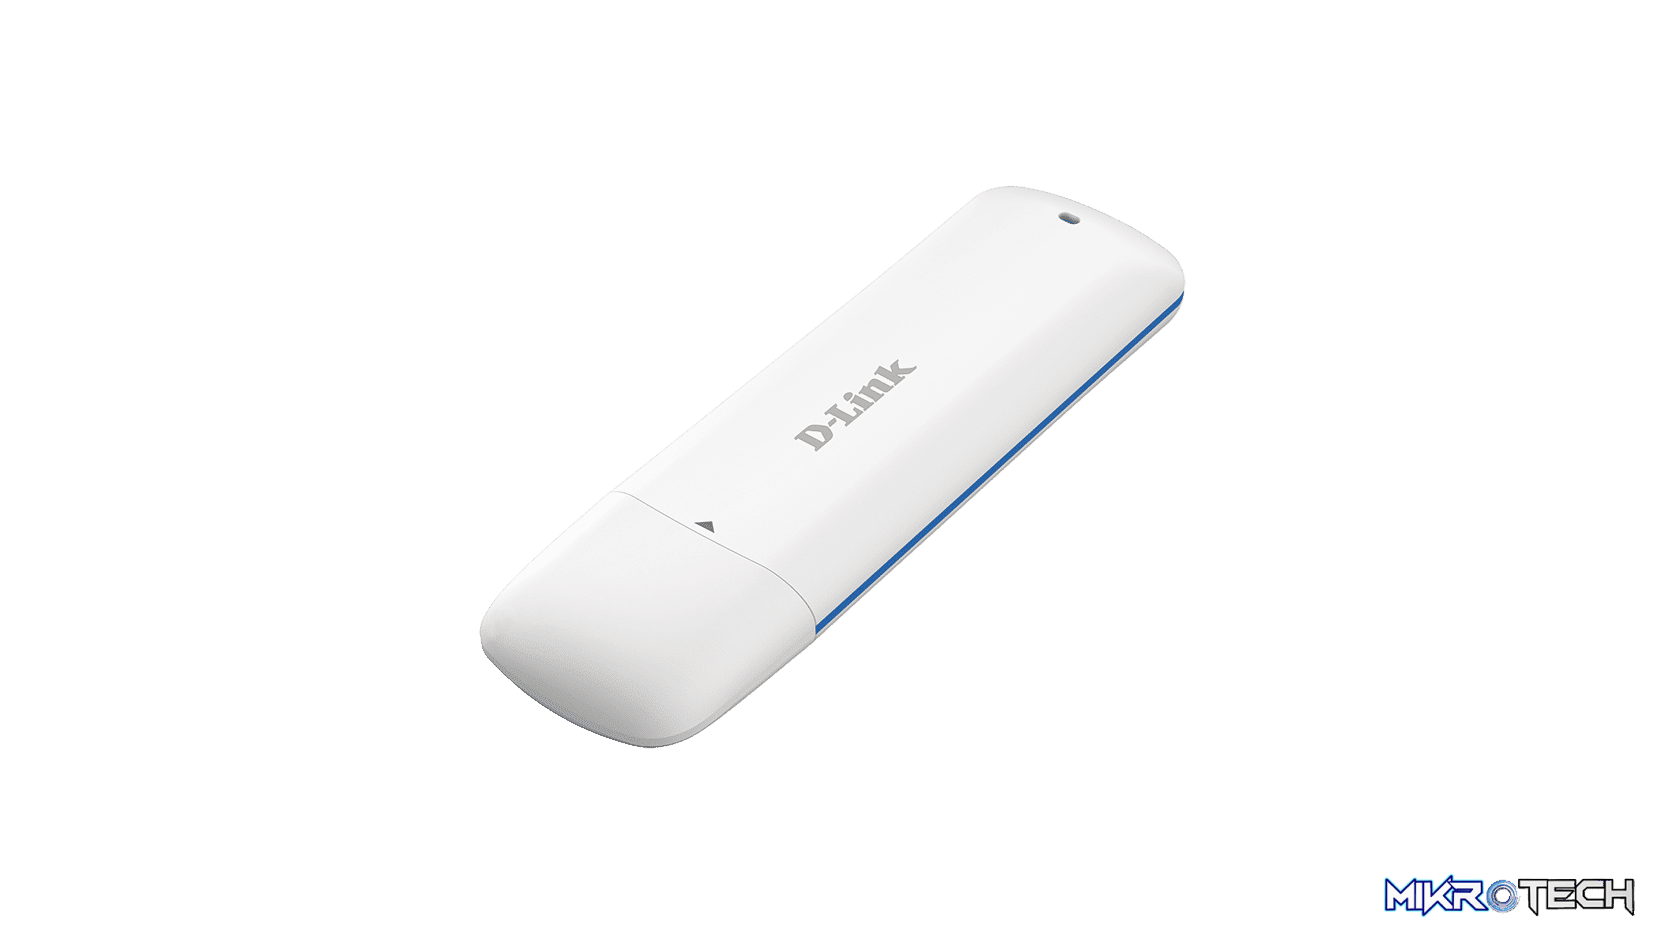 D-Link USB 2.0 HSPA+ Dual Band 3G Dongle